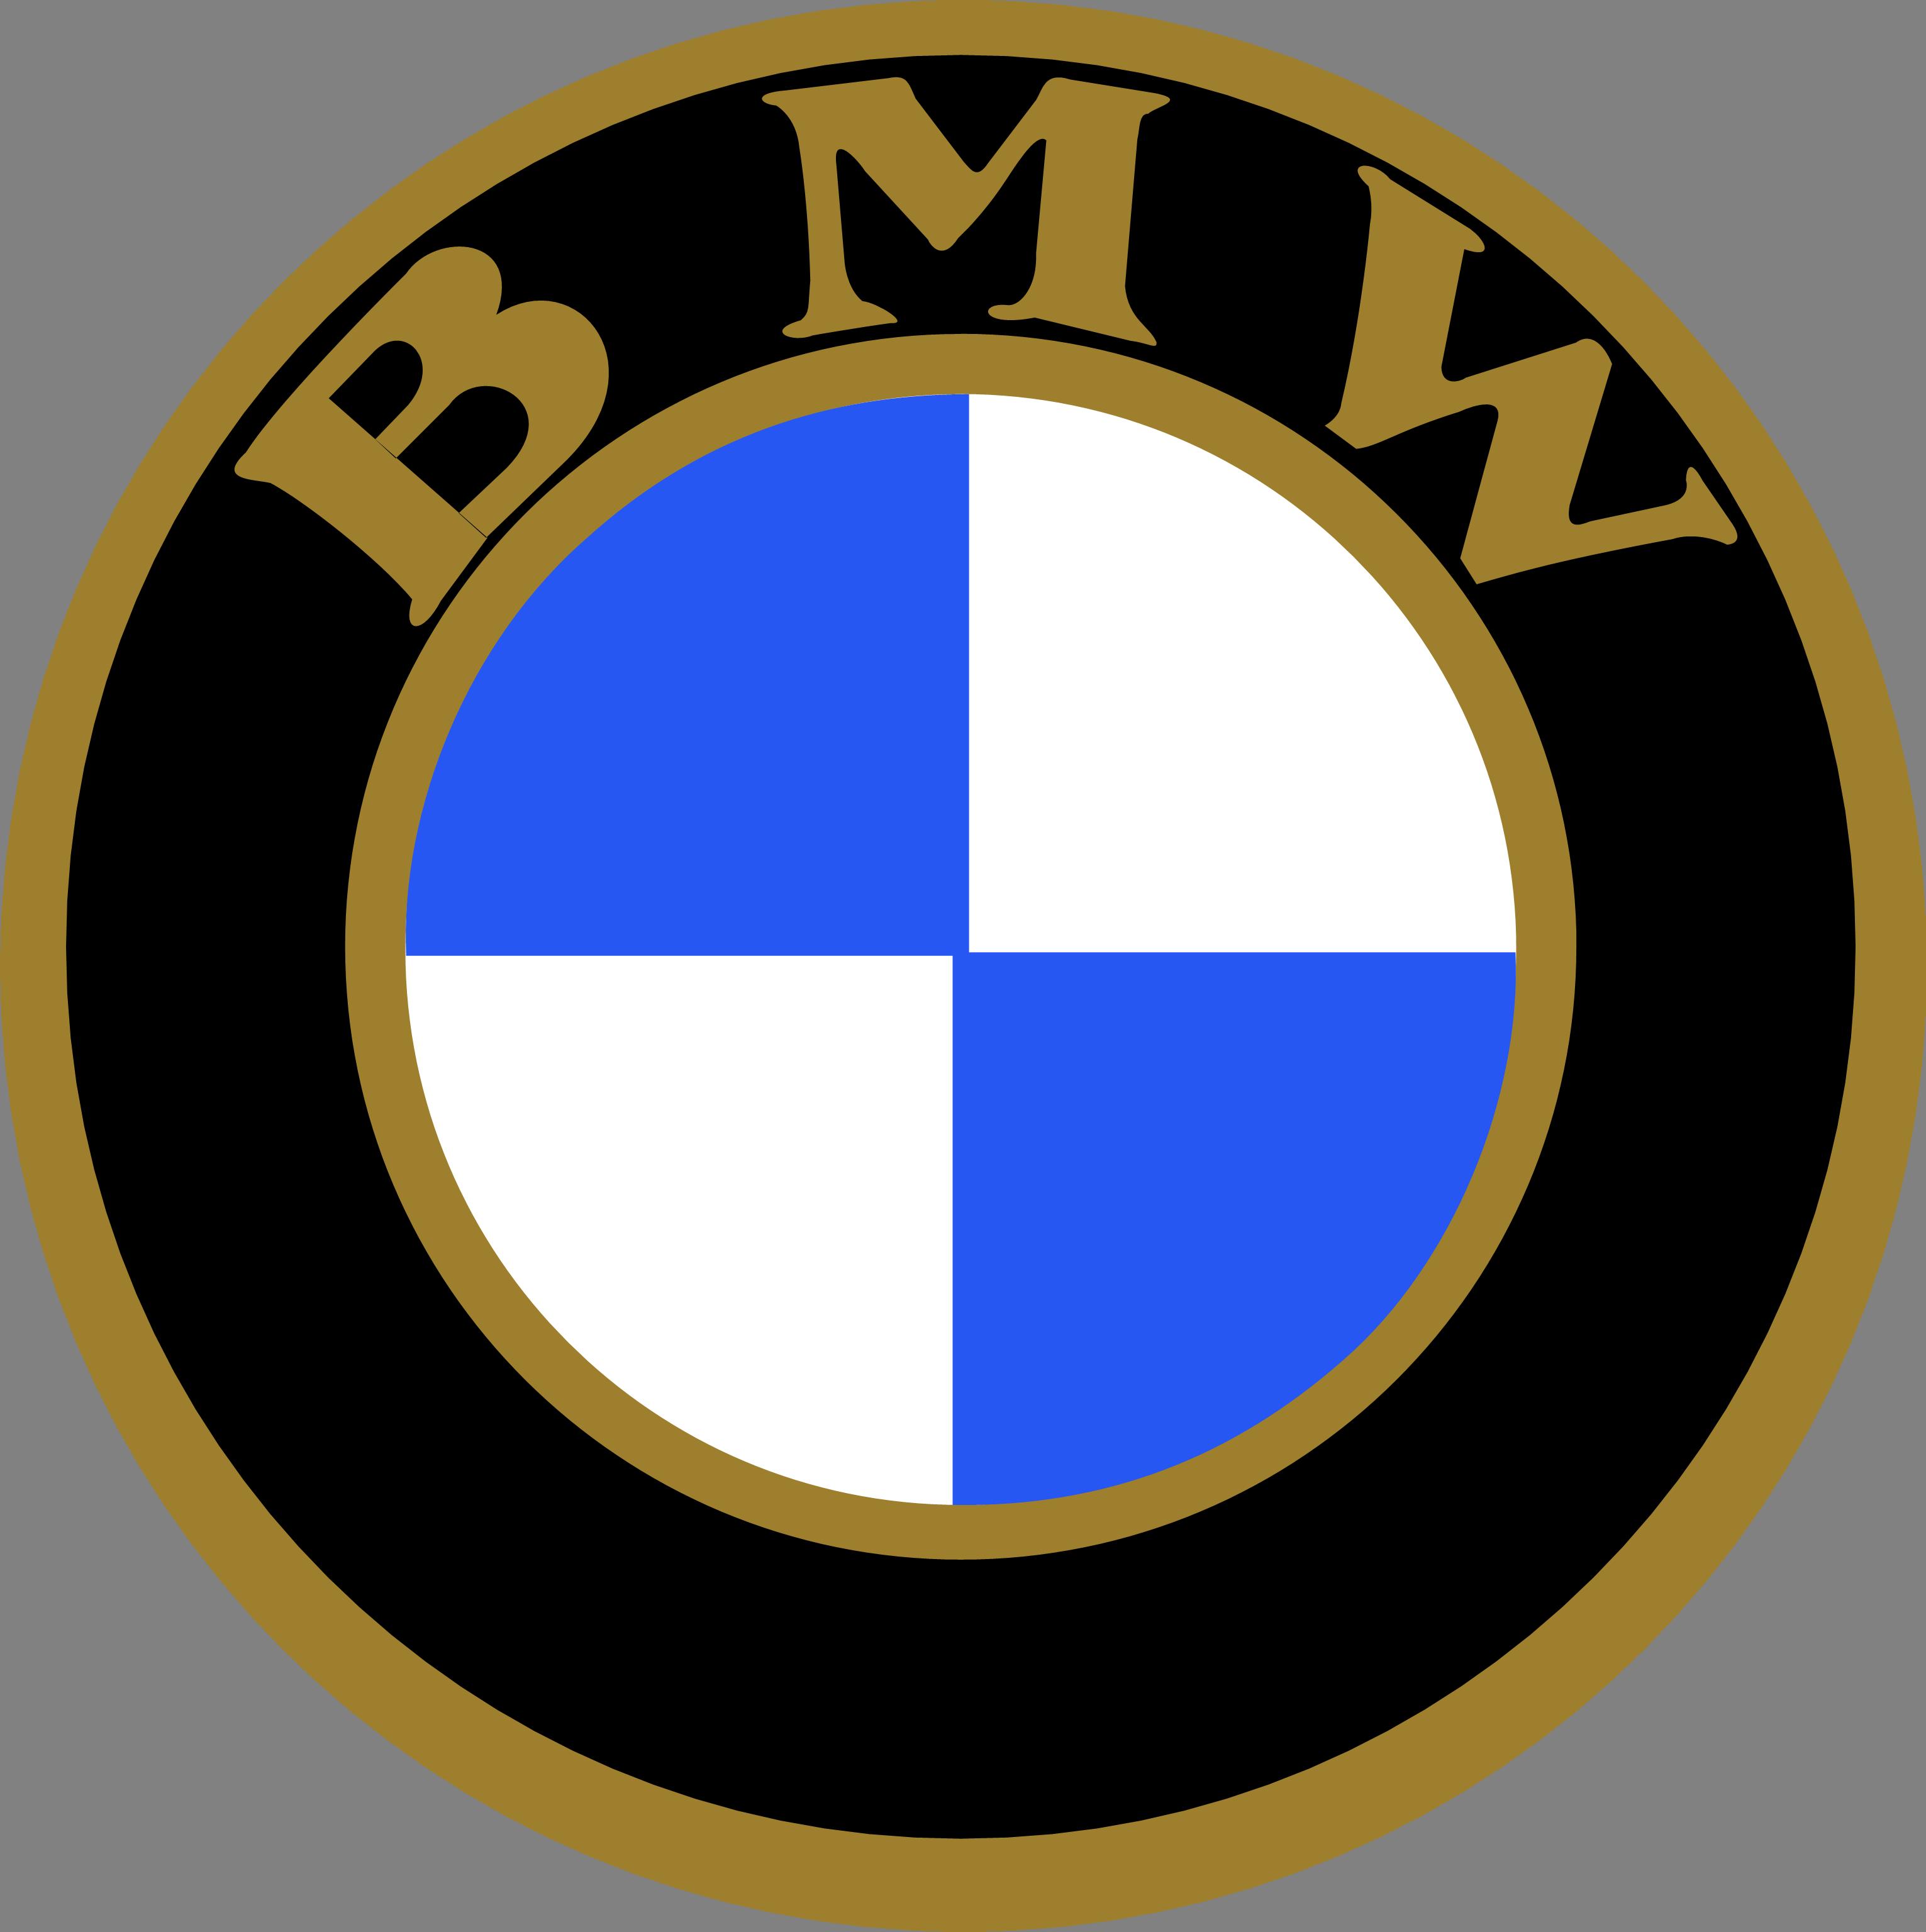 Bmw Emblem Png - Old Bmw Logo Vector Clipart - Full Size ...